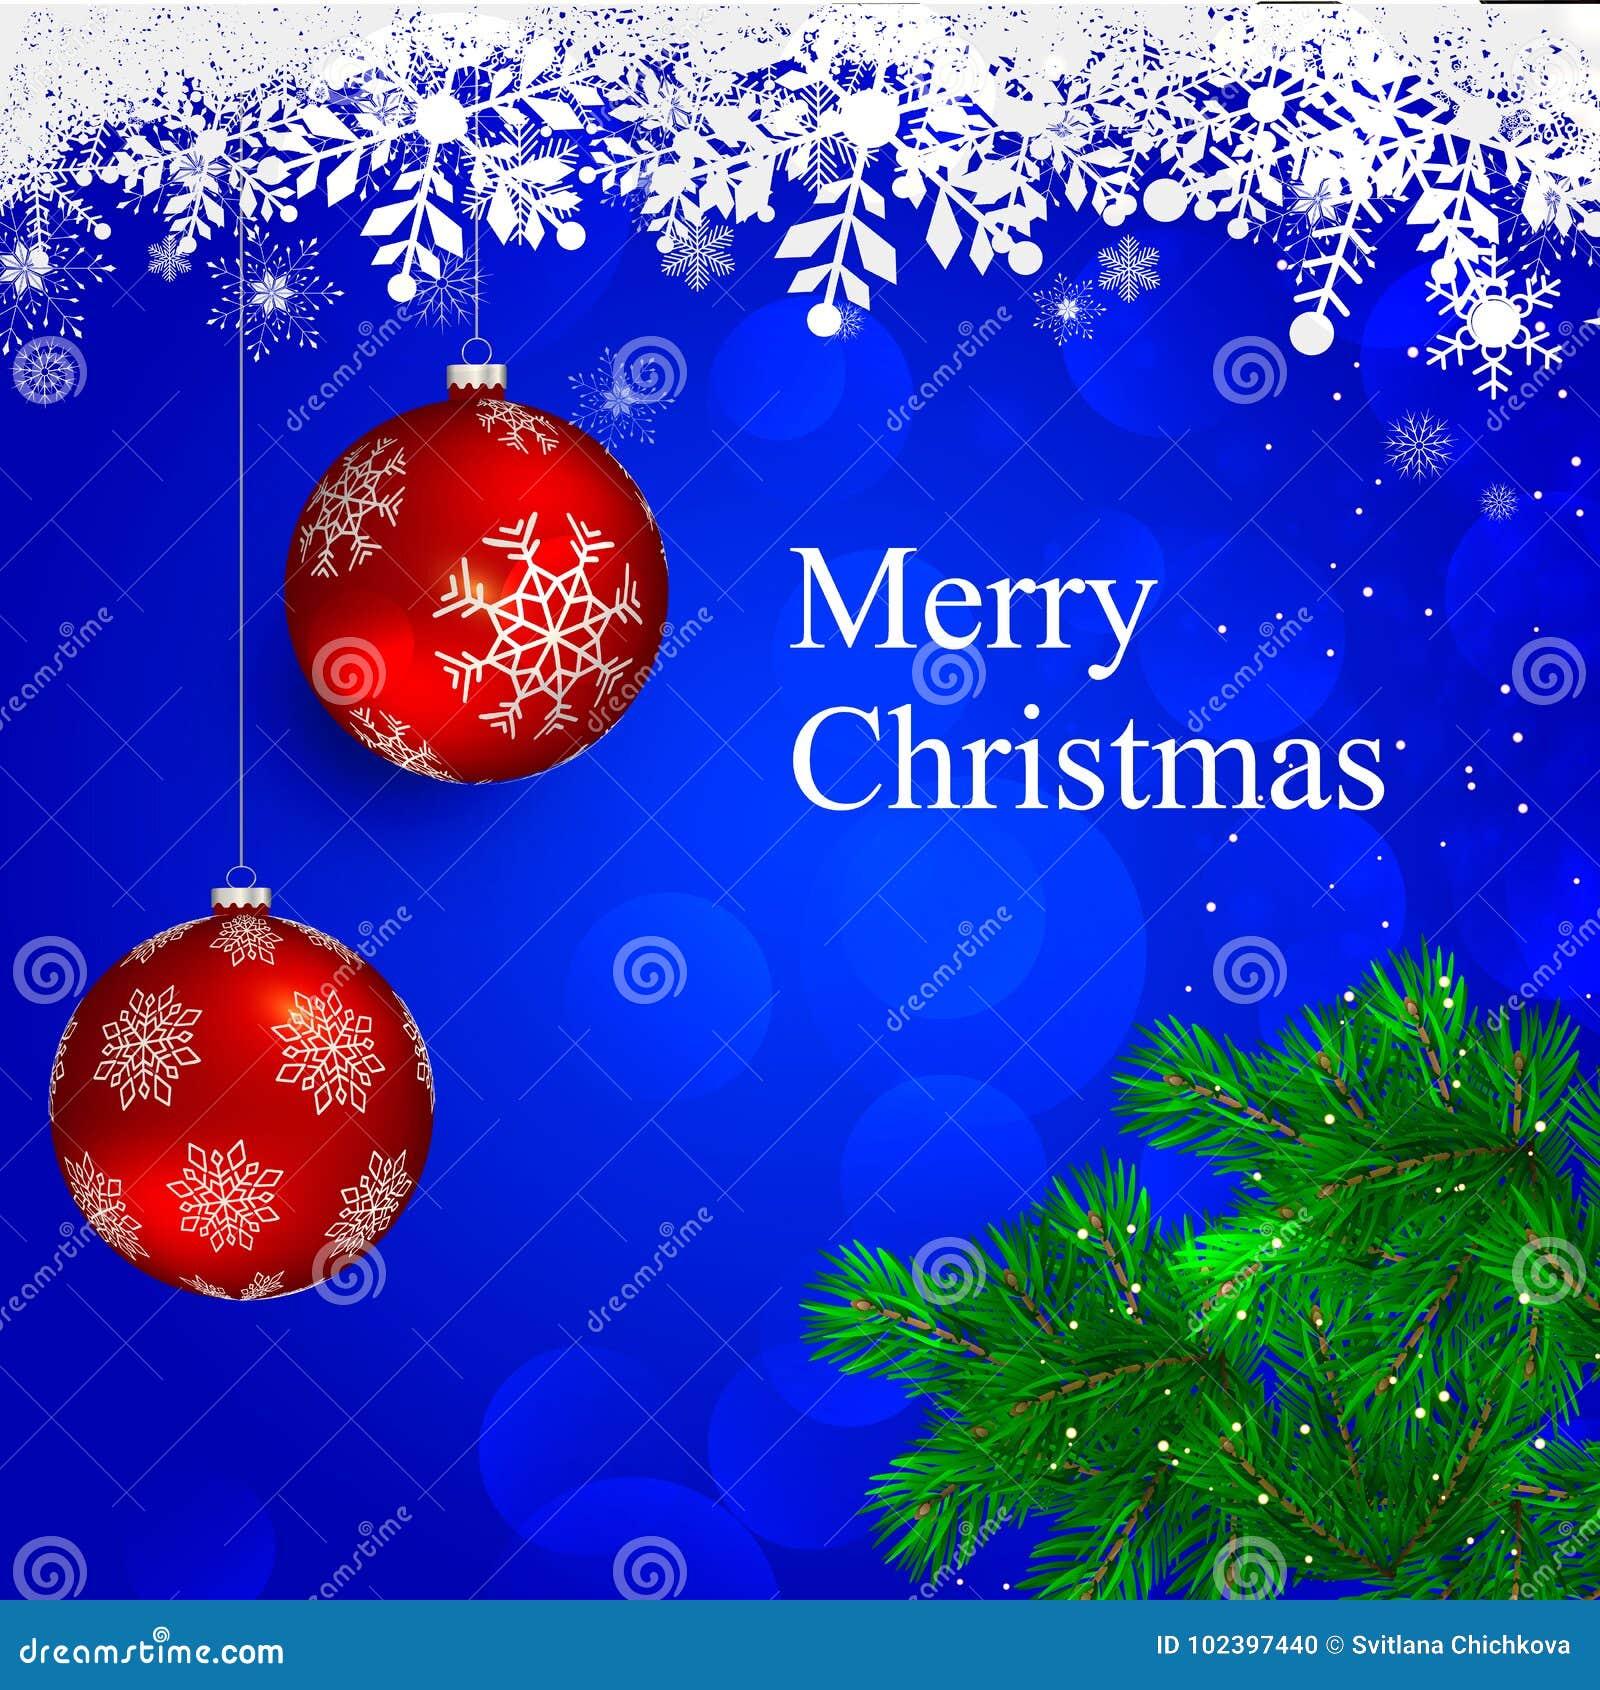 Mery Christmas stock vector. Illustration of decorative - 102397440